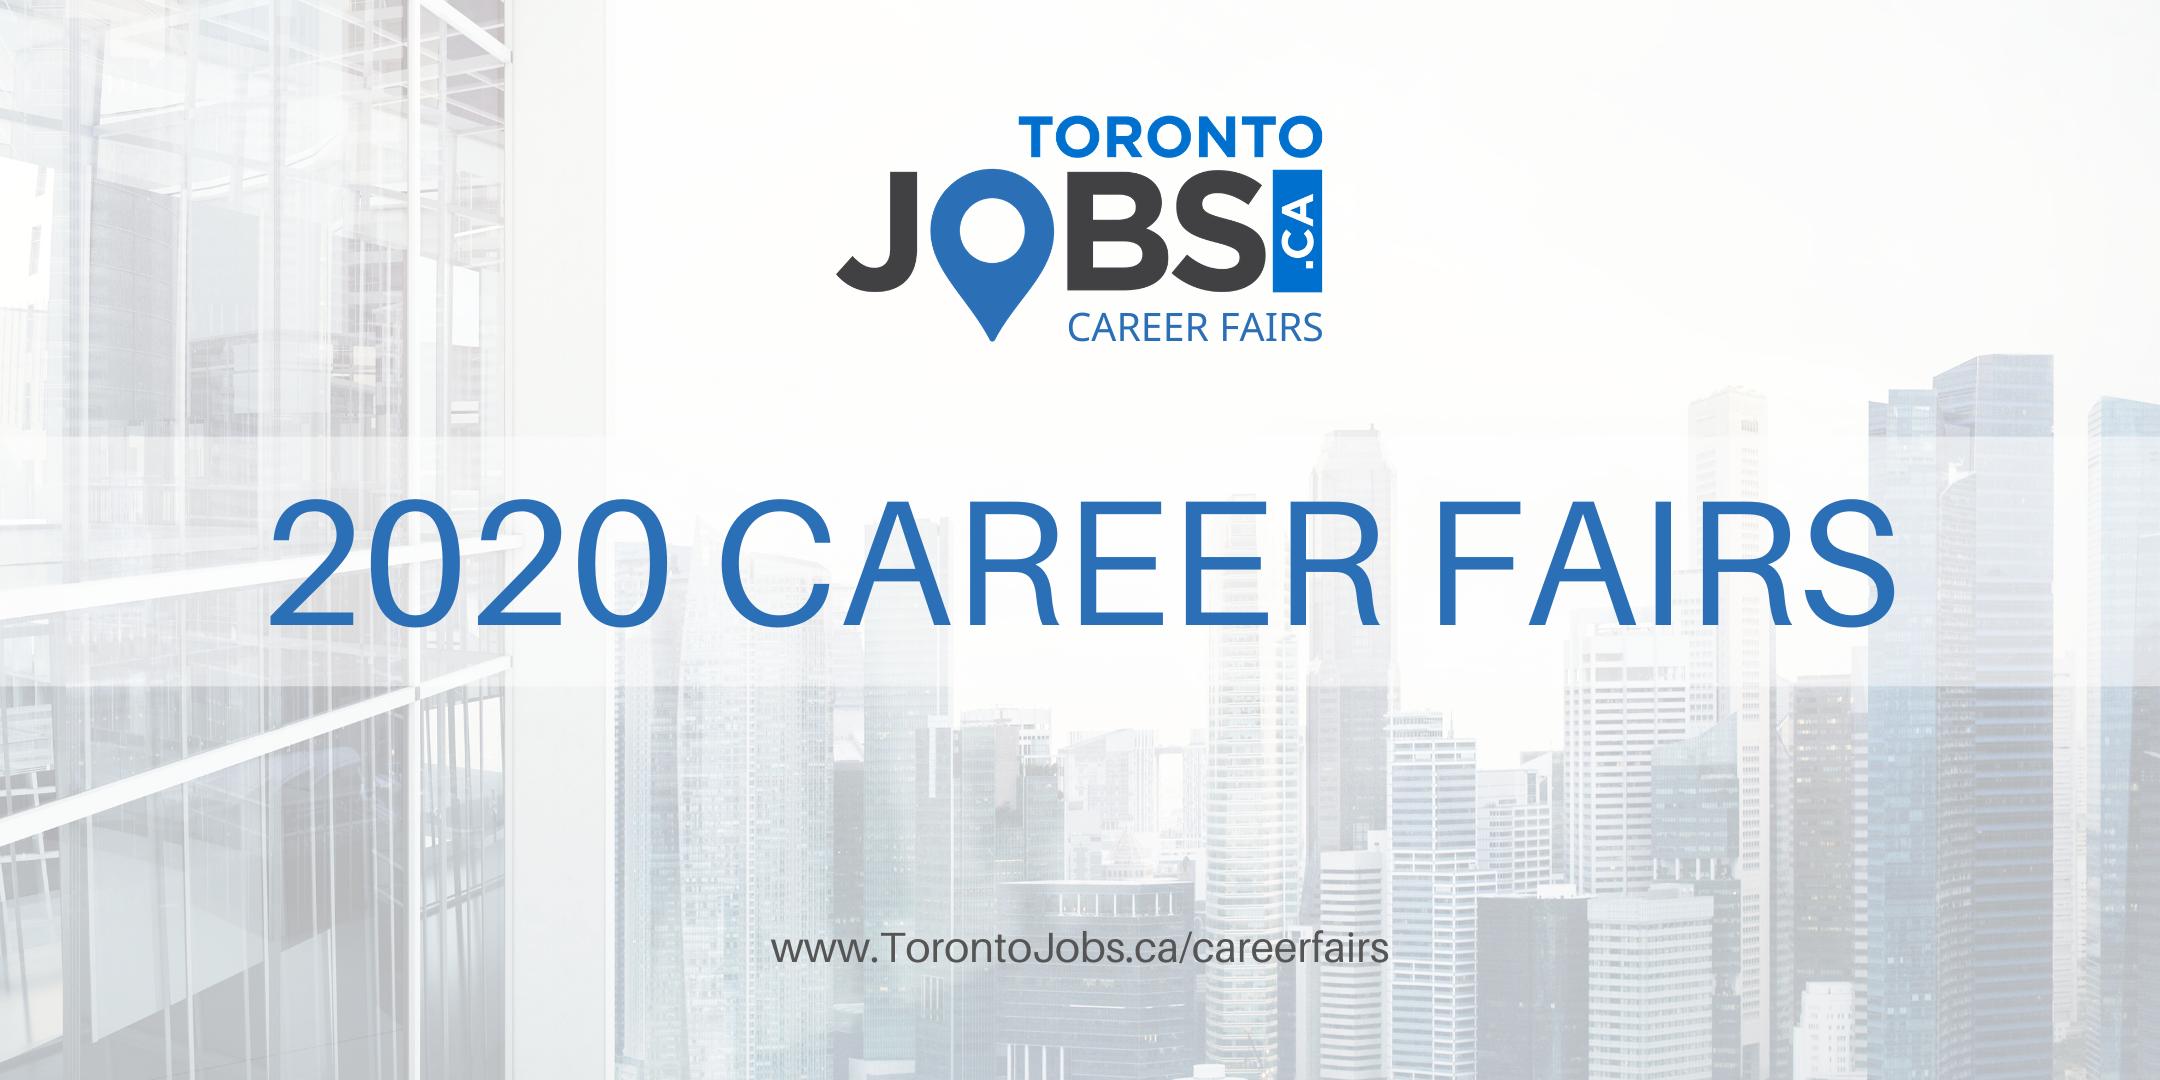 Toronto Career Fair presented by TorontoJobs.ca